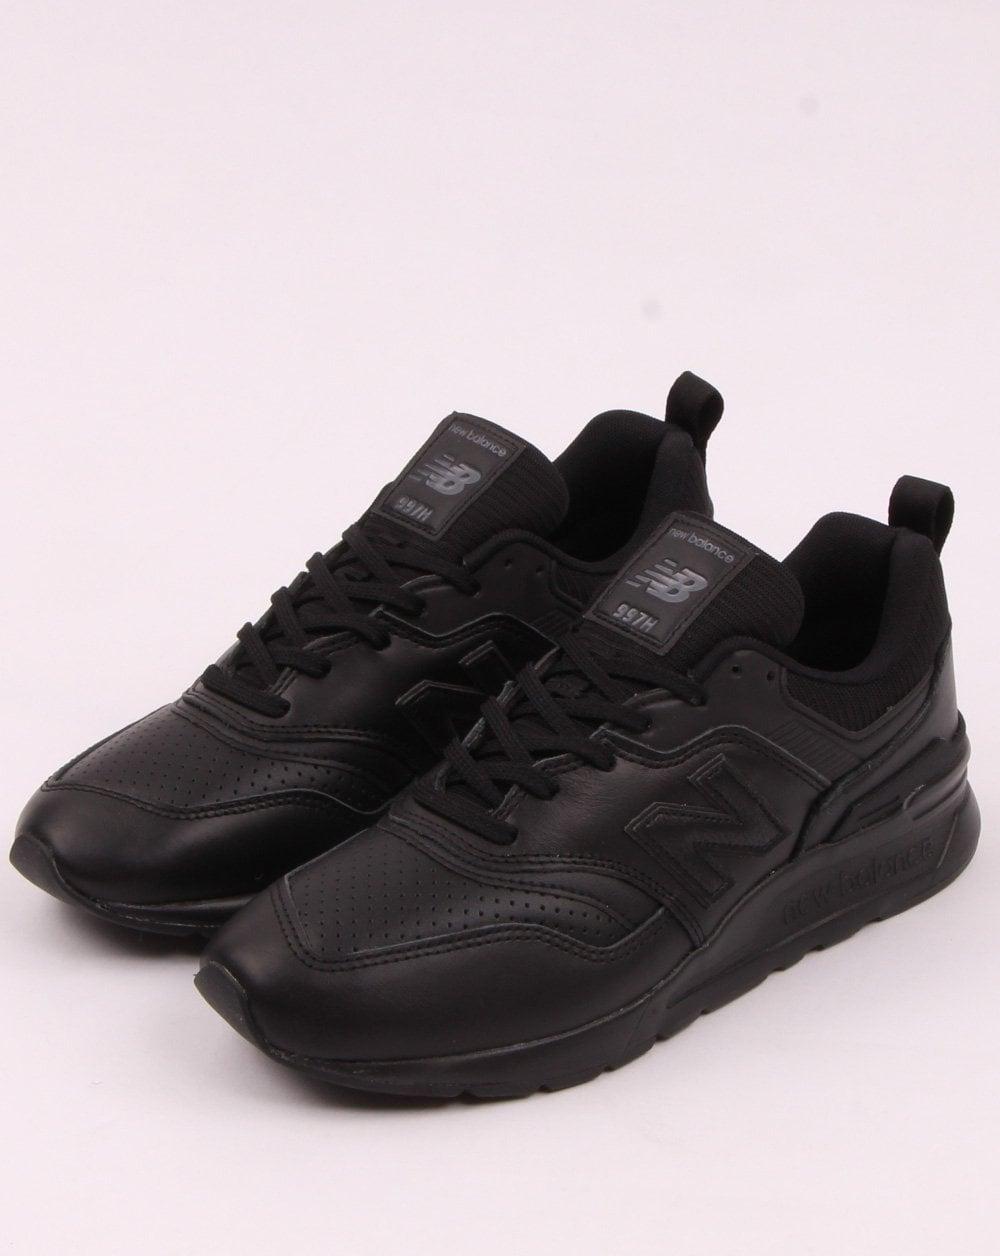 competitive price 5c8ba 782de New Balance 997 Leather Trainers Black